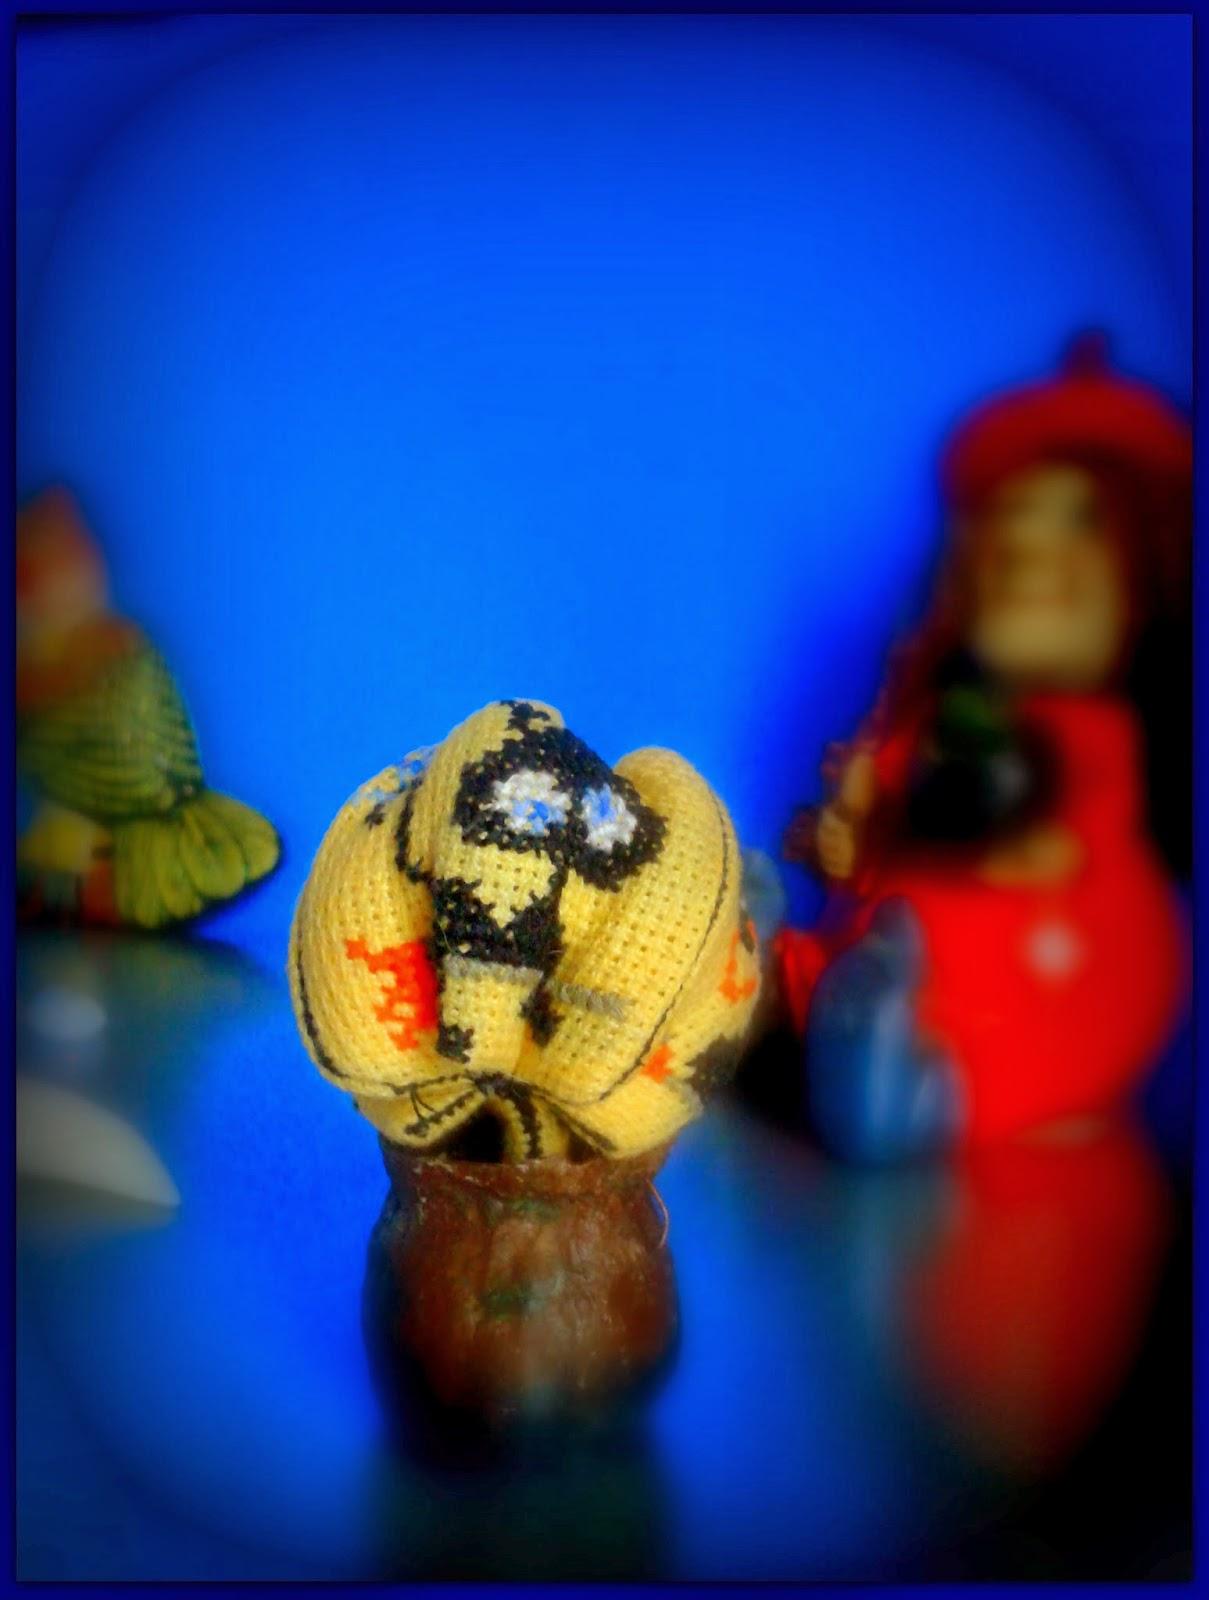 Ведьмочка, ведьма, кривулька, мини, миниатюра, кривулька бутон, хелоуин